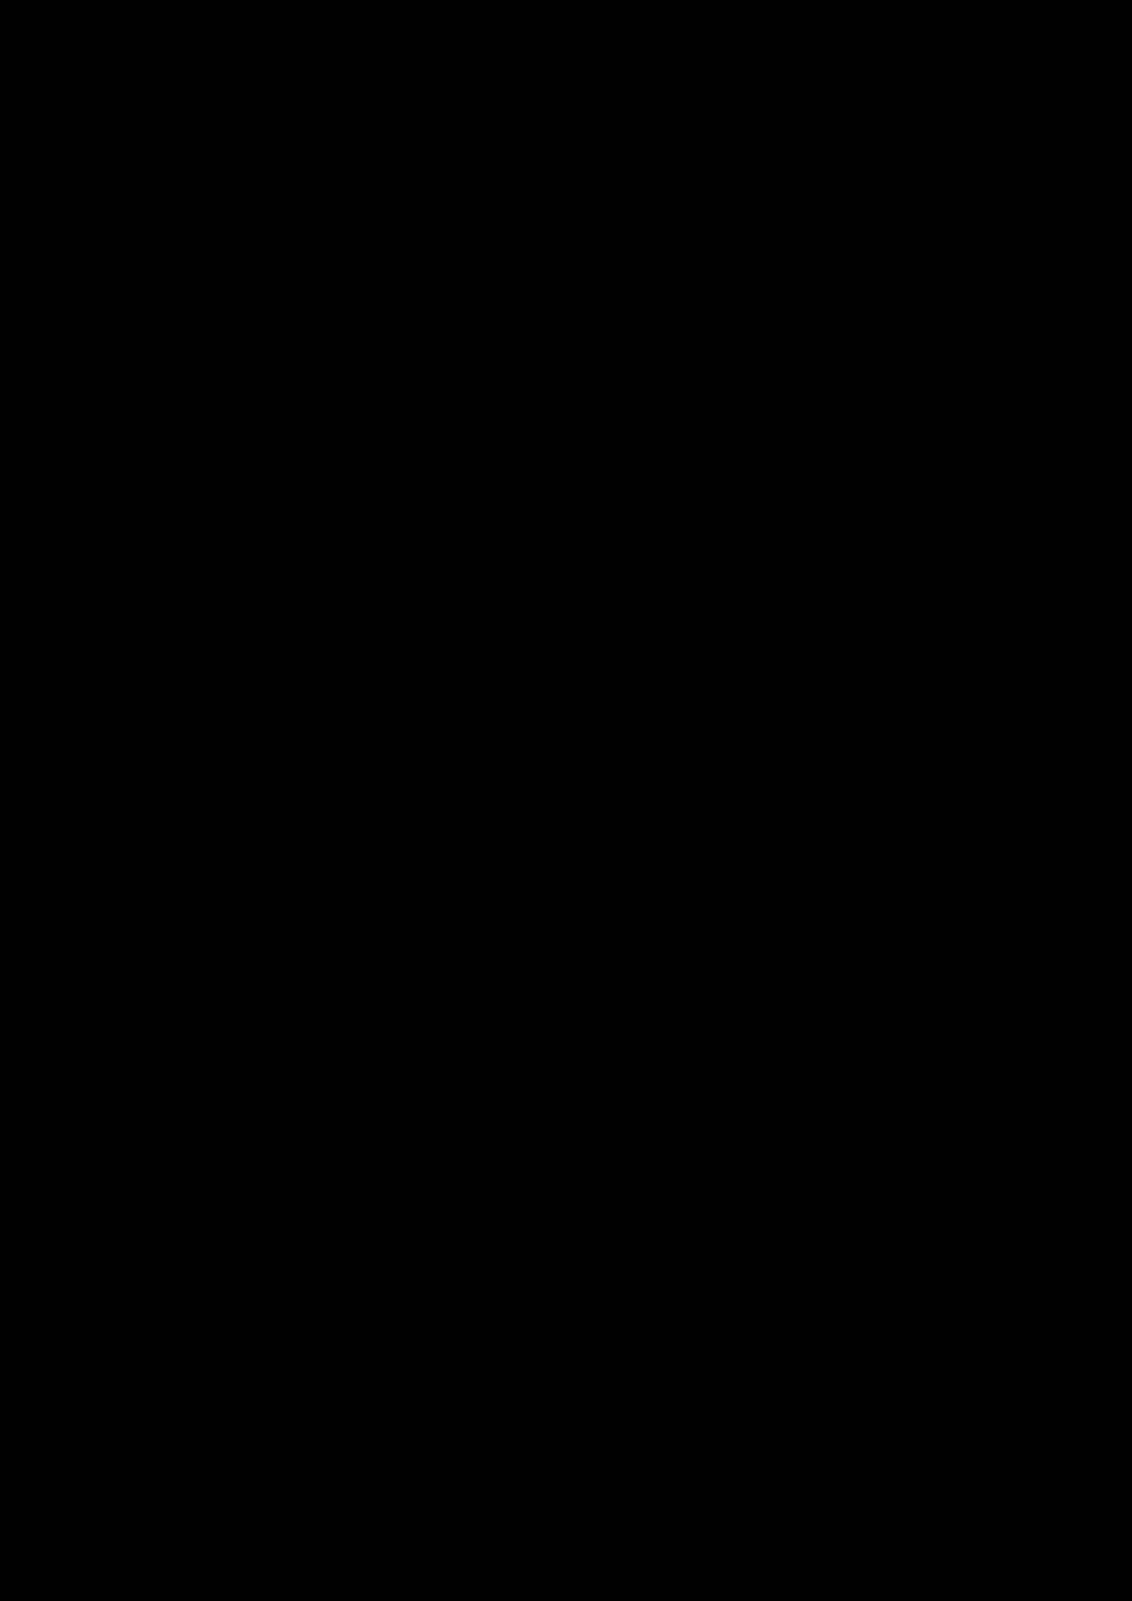 Prosti slide, Image 17